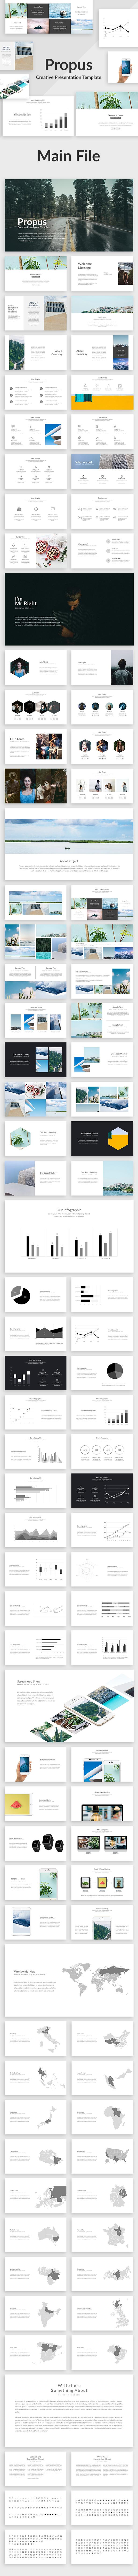 Propus - Creative Keynote Template - Creative Keynote Templates